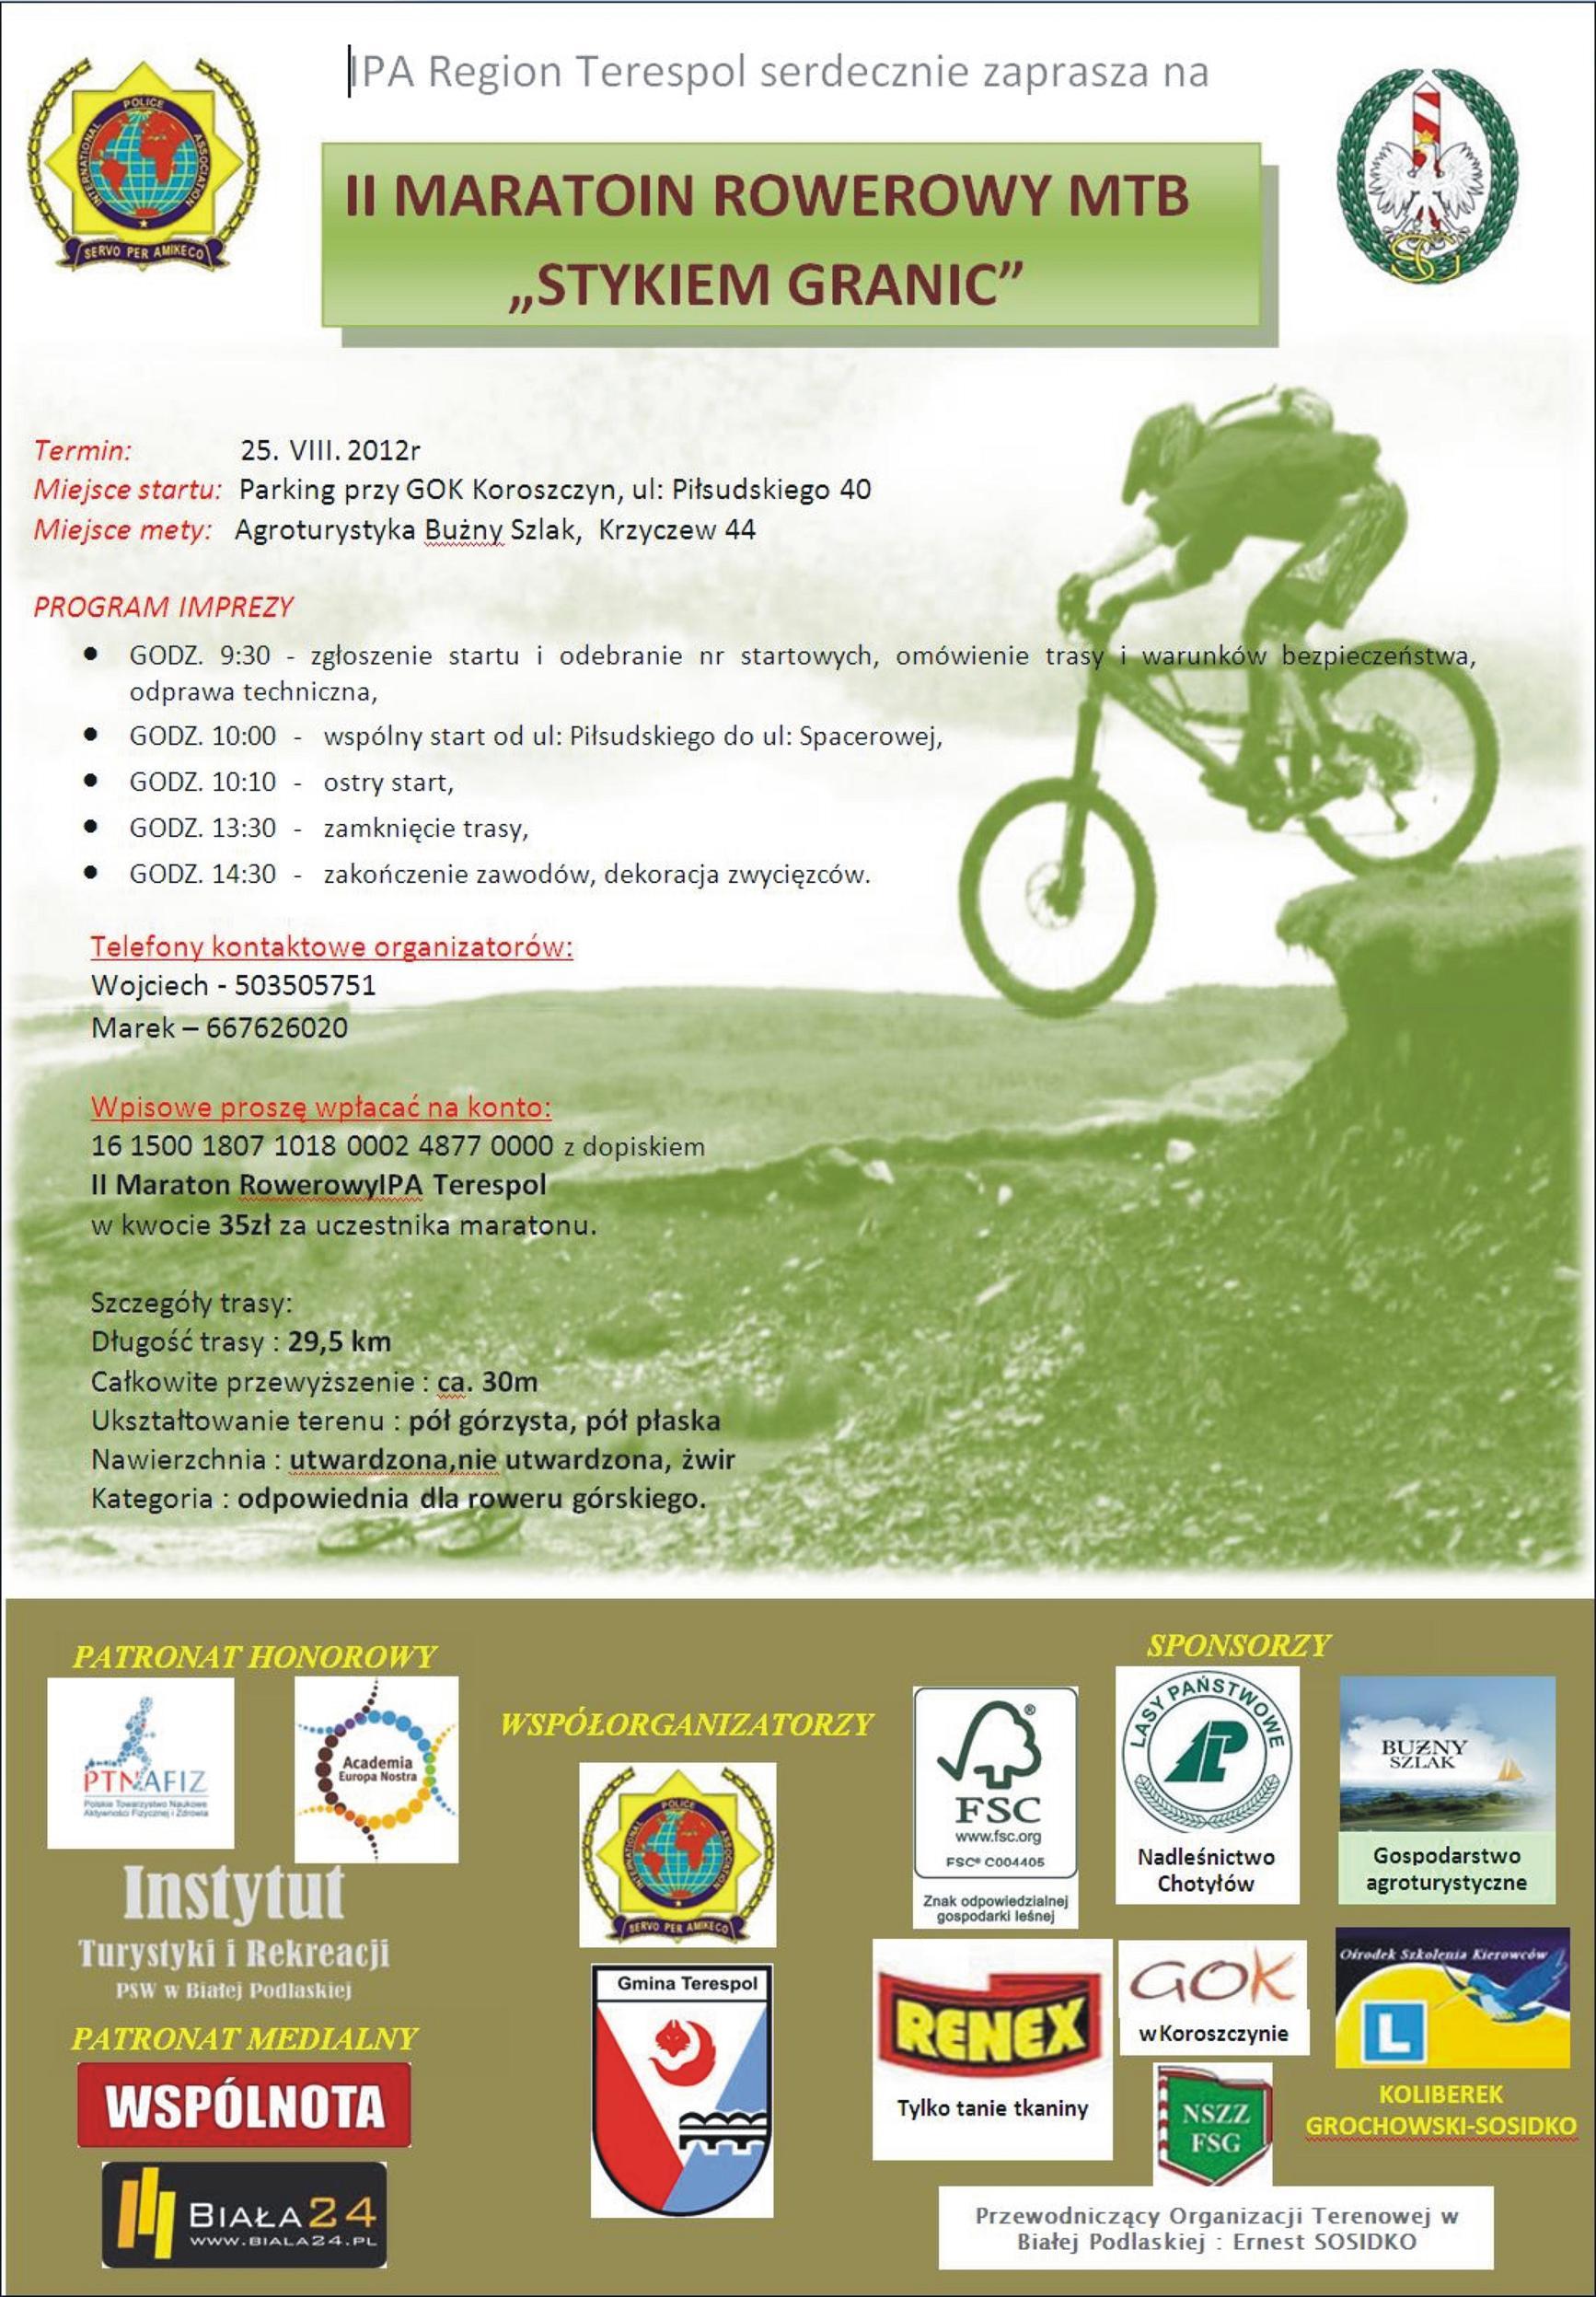 Maraton III edycja IPA Region  Terespol